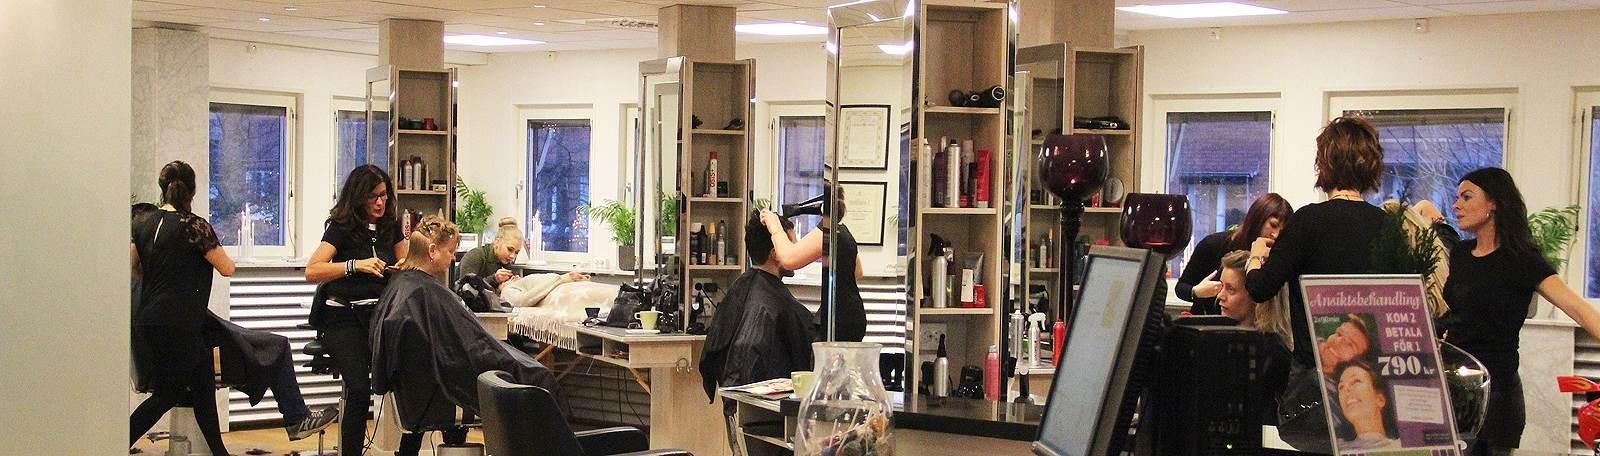 salong studio 5 nyköping